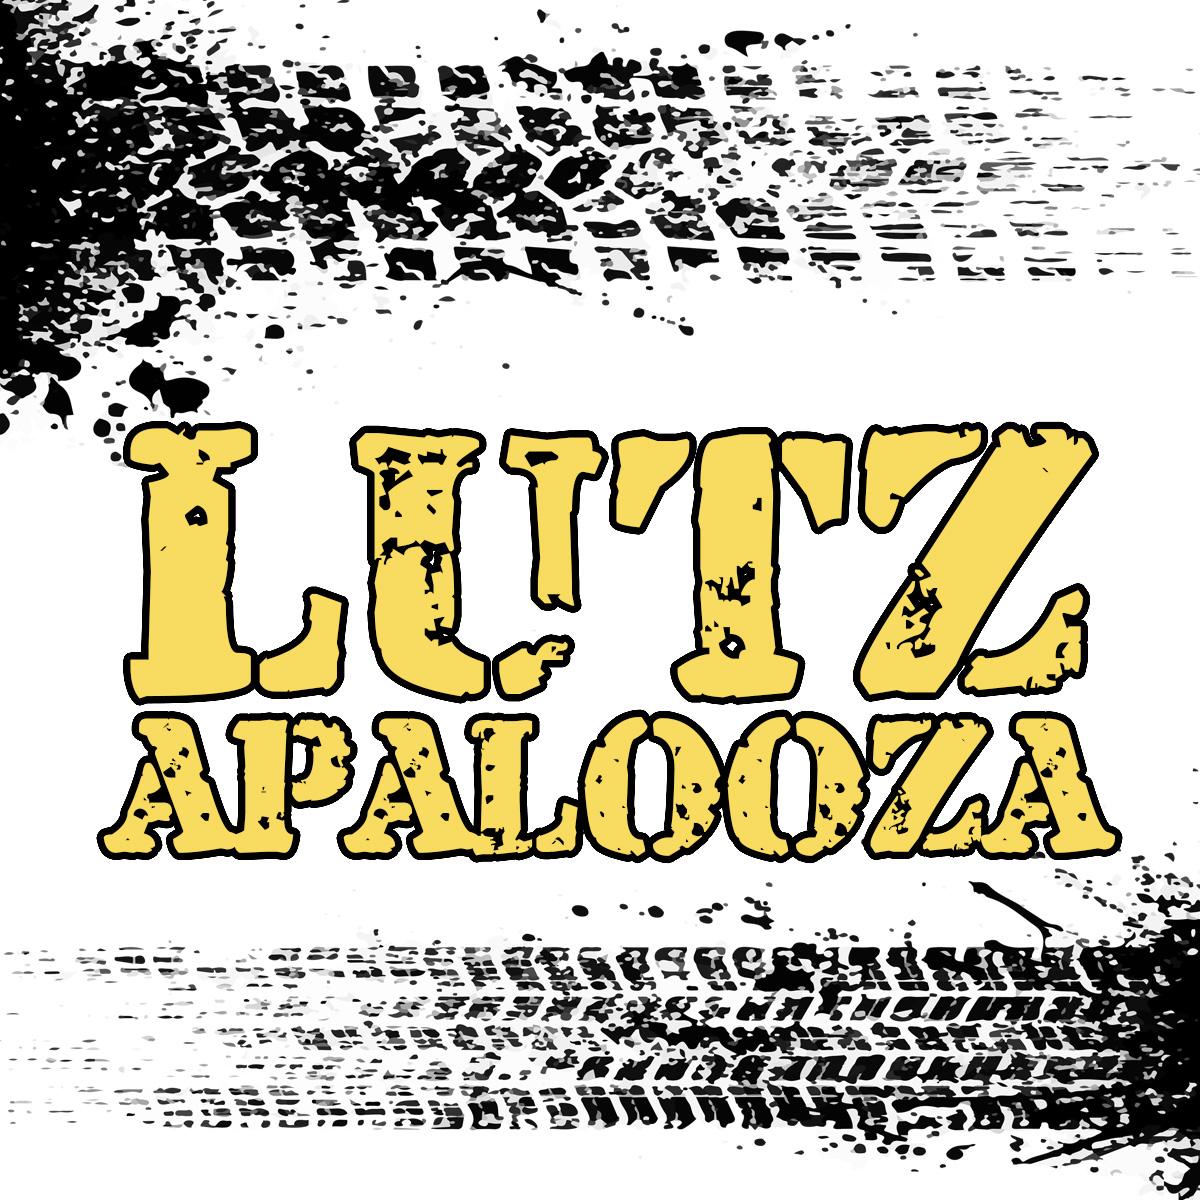 LUTZapalooza Motorcycle Rider